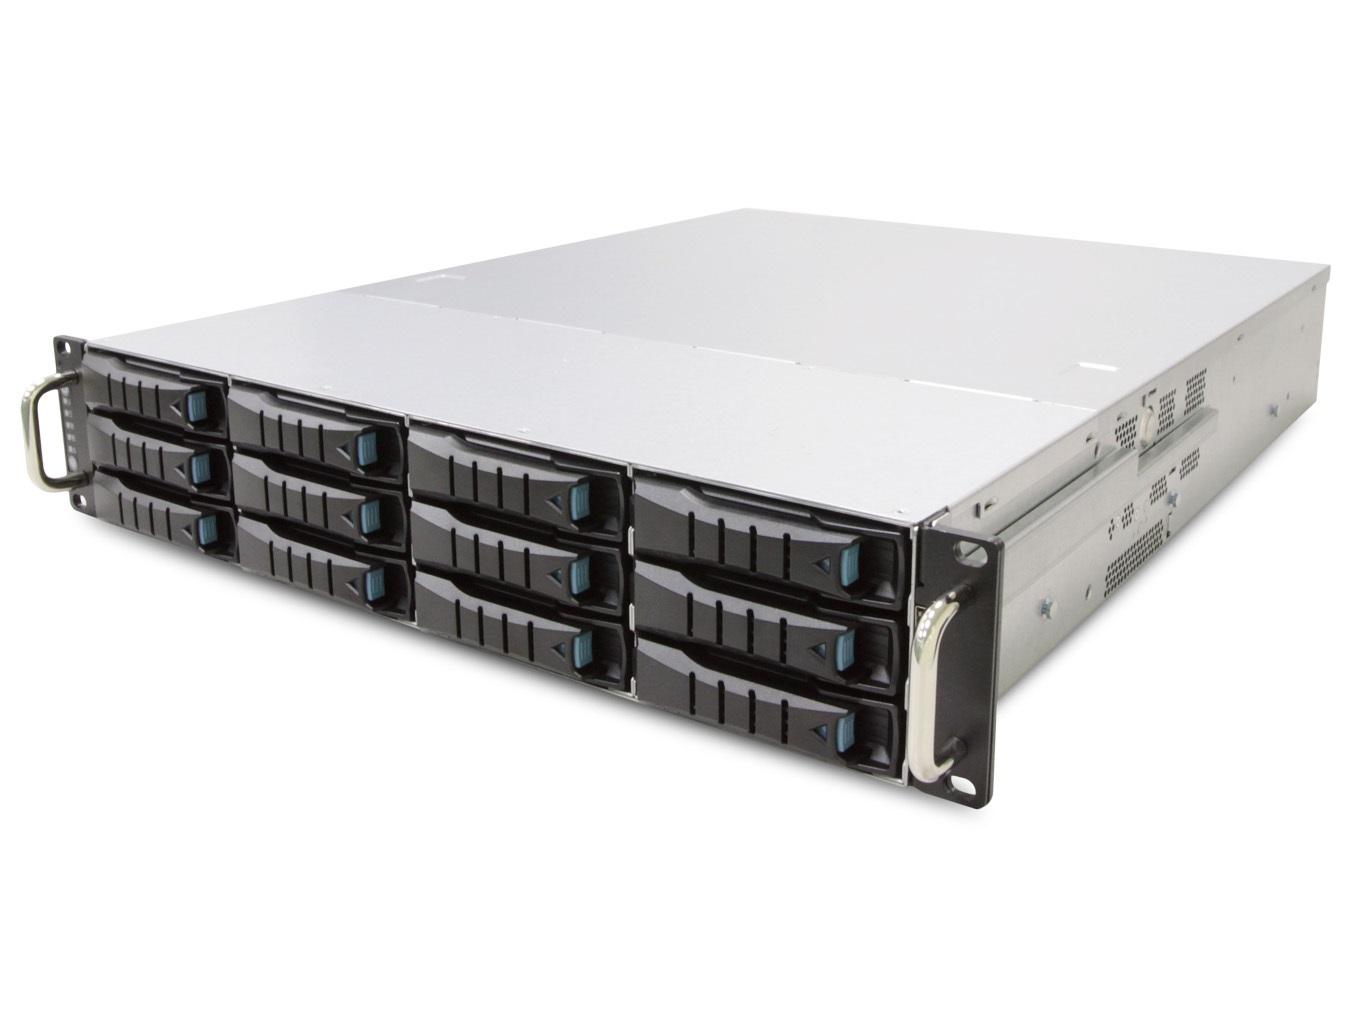 AIC RSC-2ETS XE1-2ETS0-02 2U 12-bay Storage Server Chassis